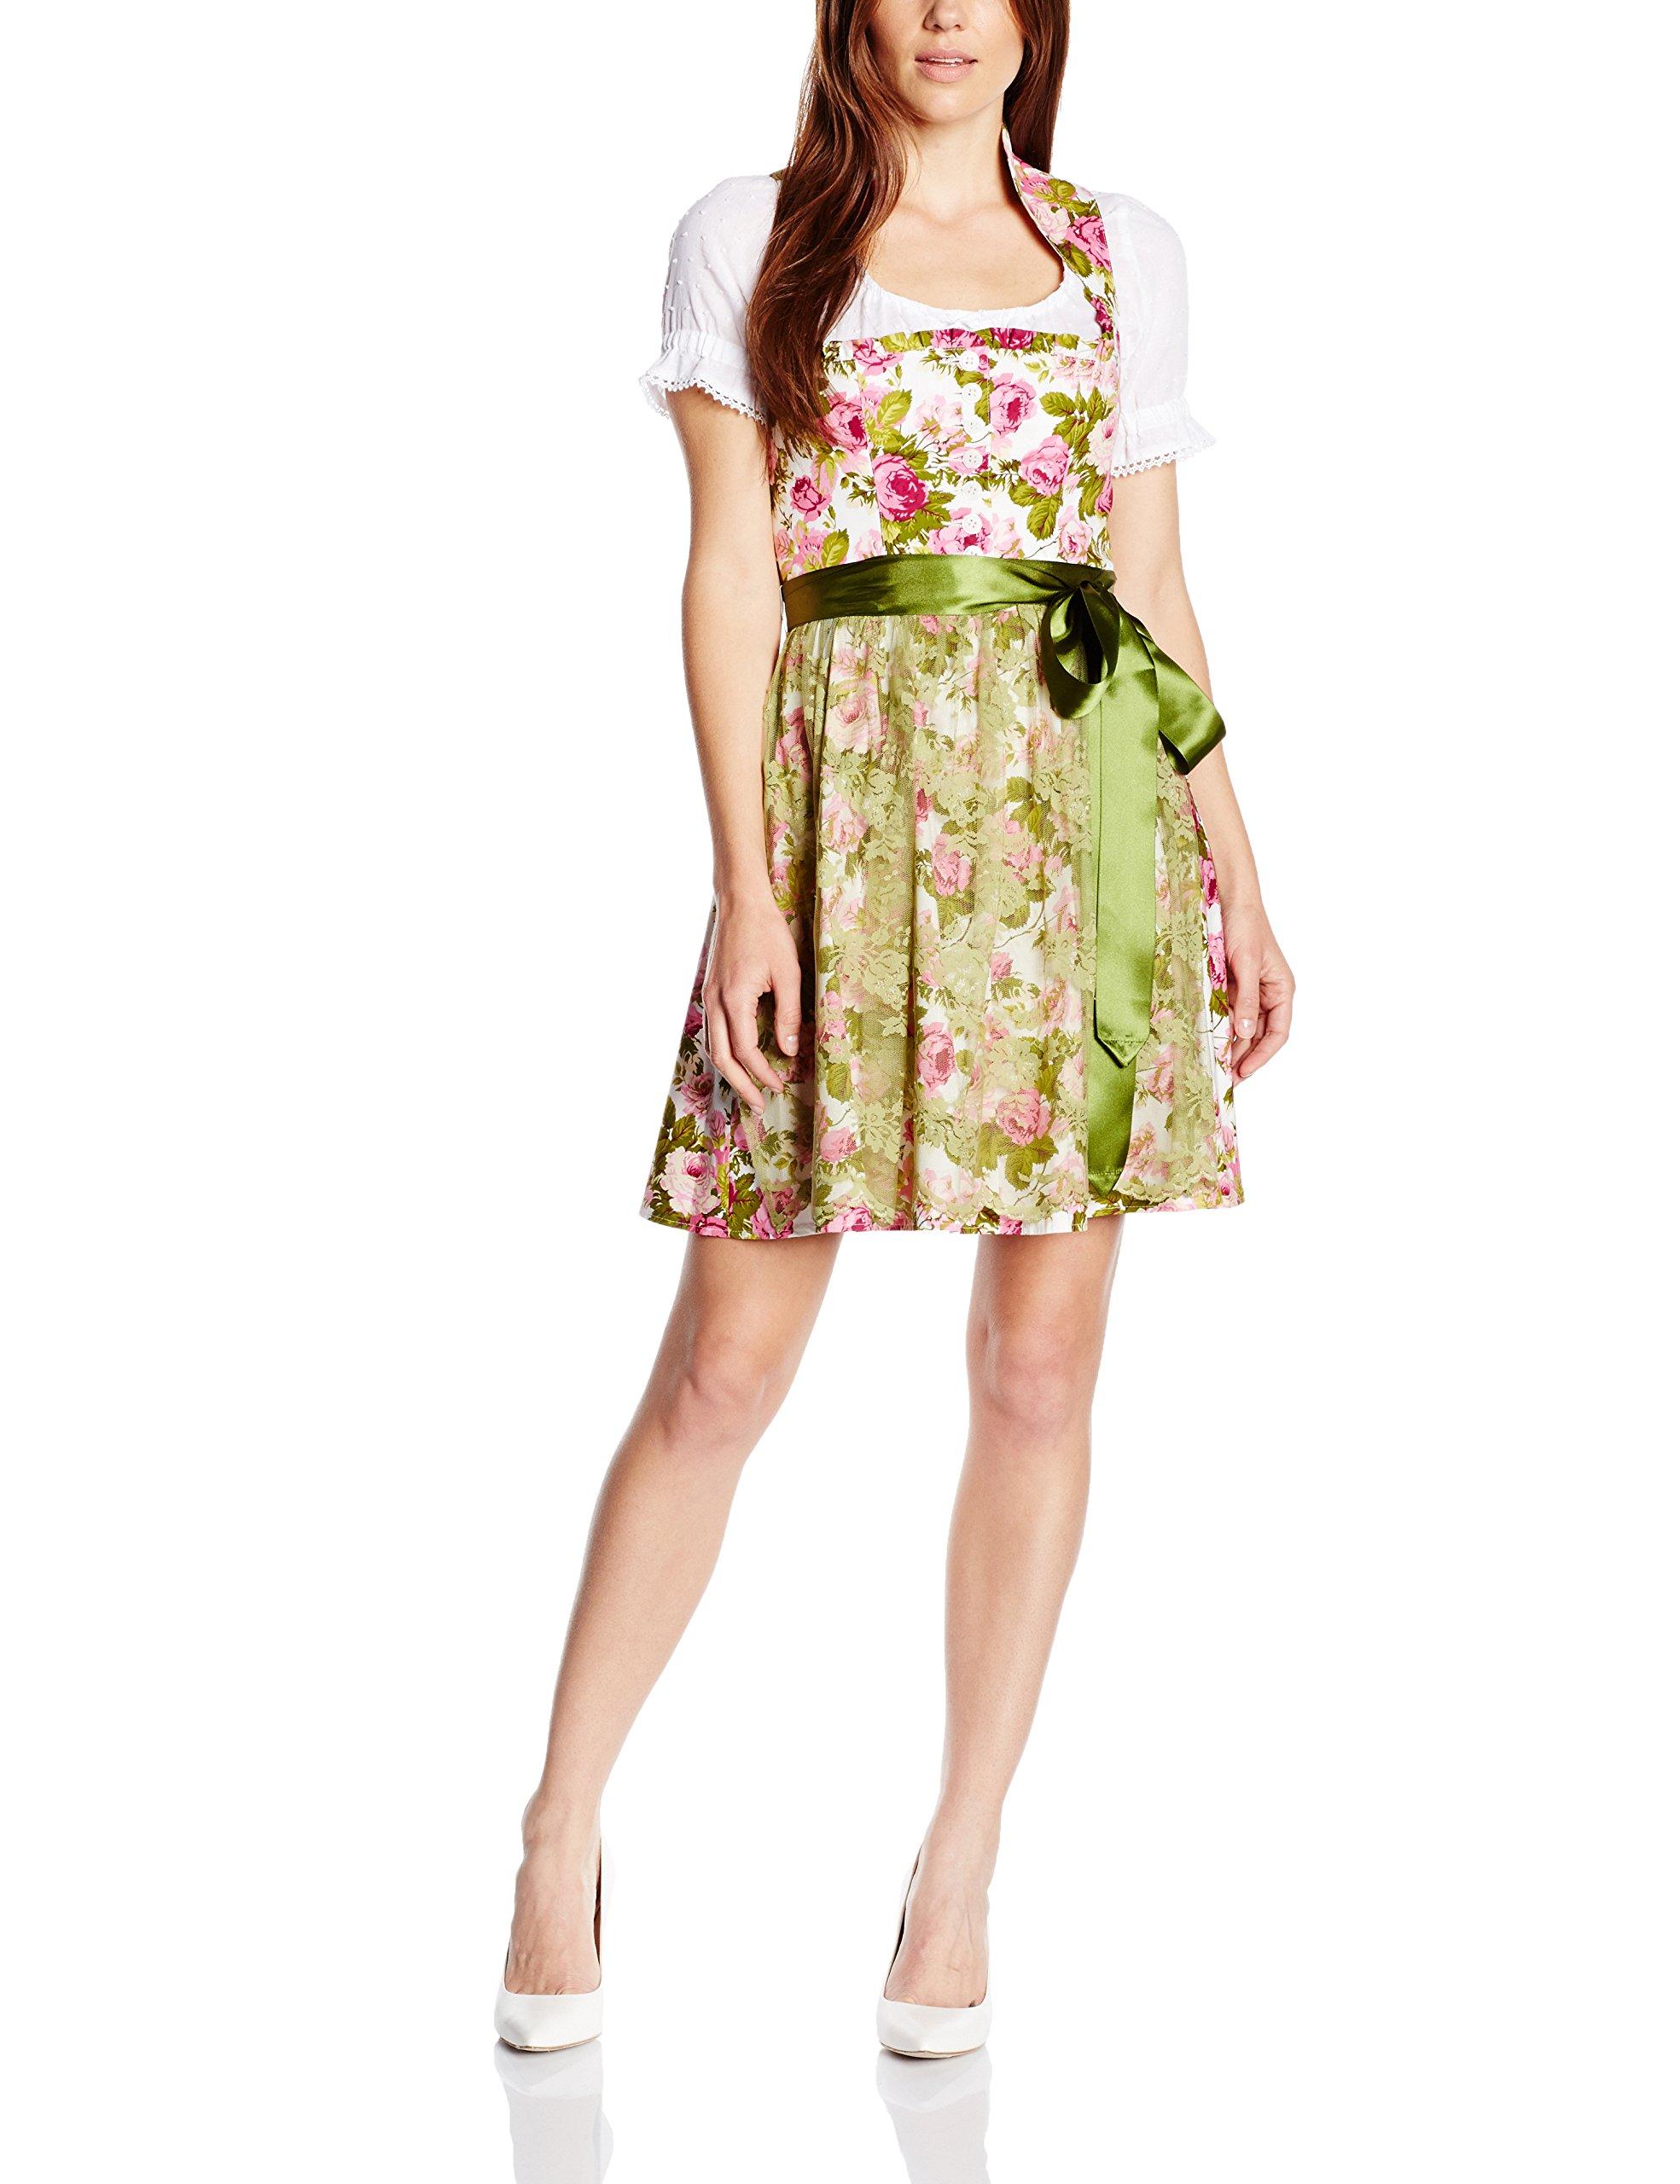 Multicolore Wolff 182742 856050 grün Robe Femme Berwinamp; mehrfarbigrosa vmN0O8nw